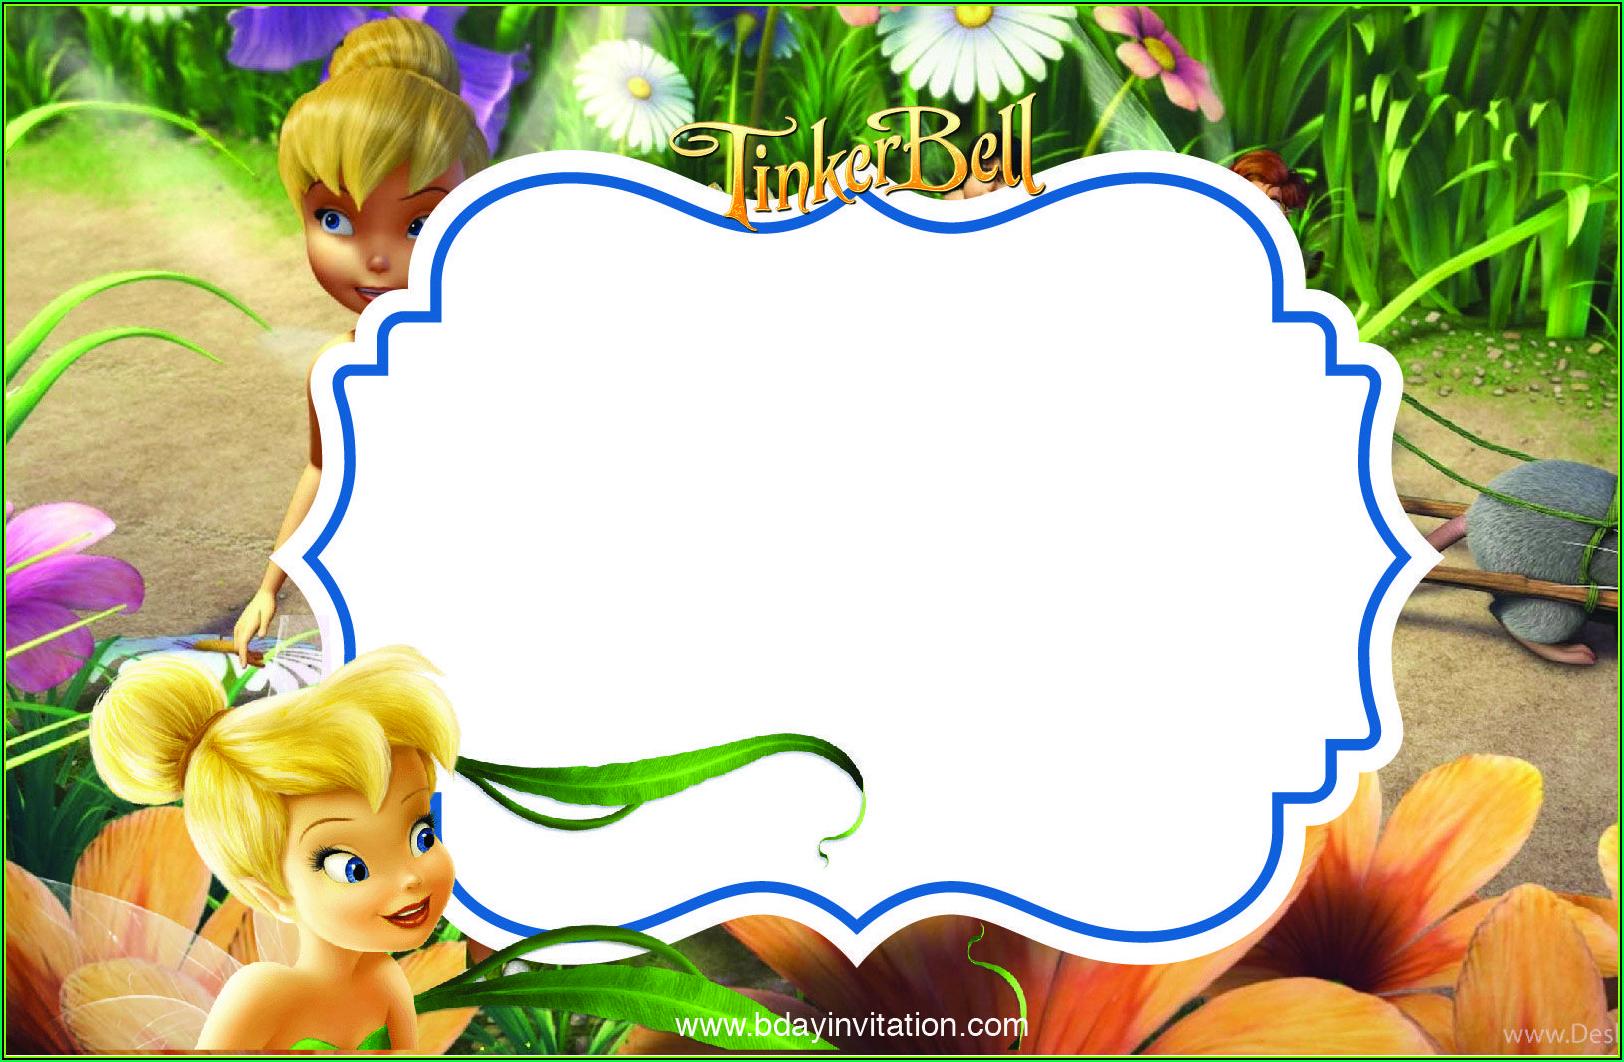 Free Tinkerbell Birthday Invitation Templates